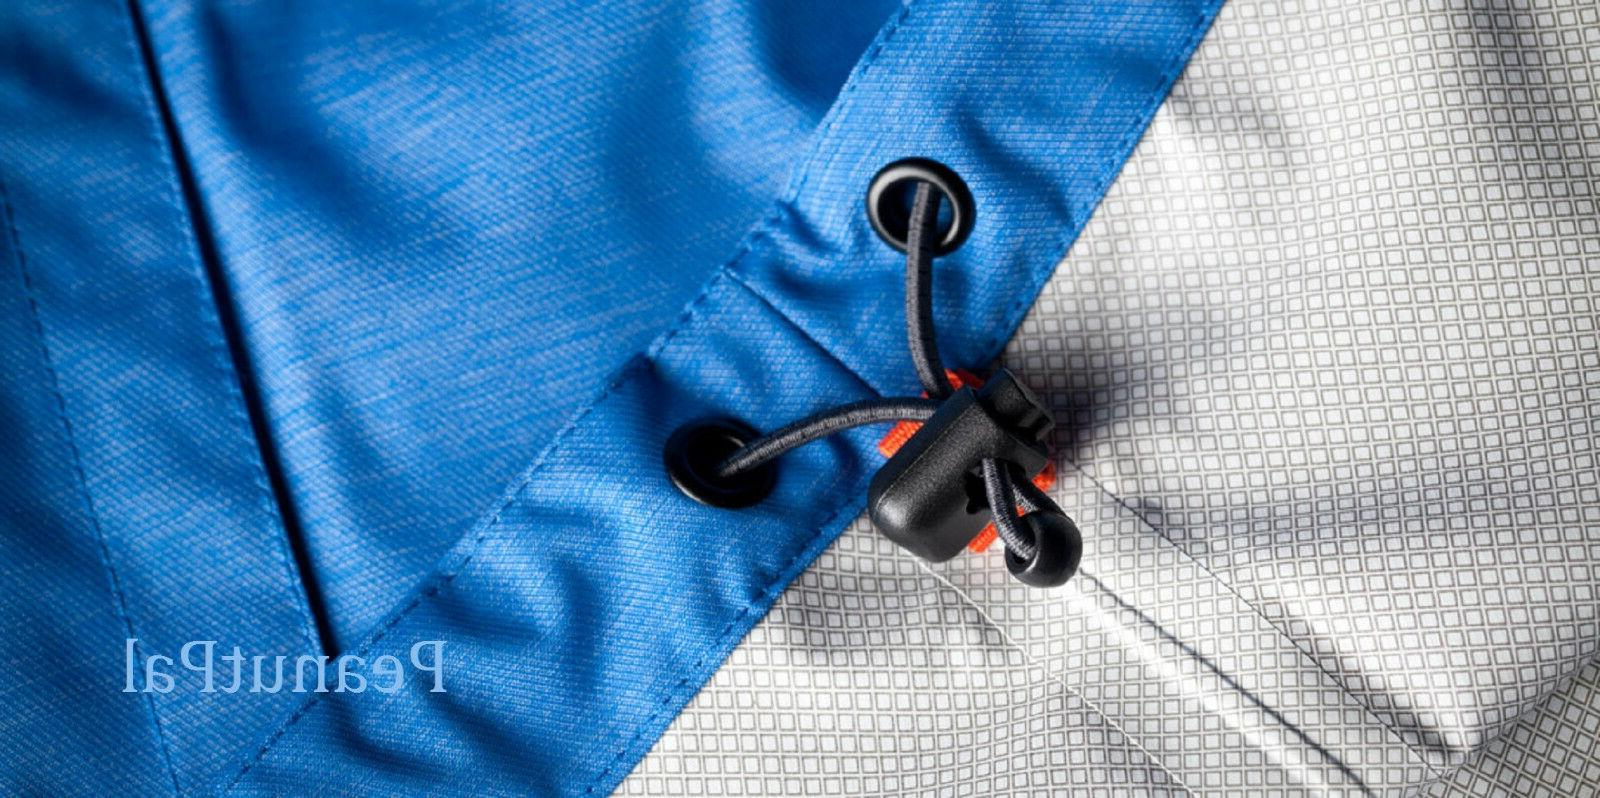 Paradox Men's Waterproof Rain Jacket Underarm Pit Zip Ventilation